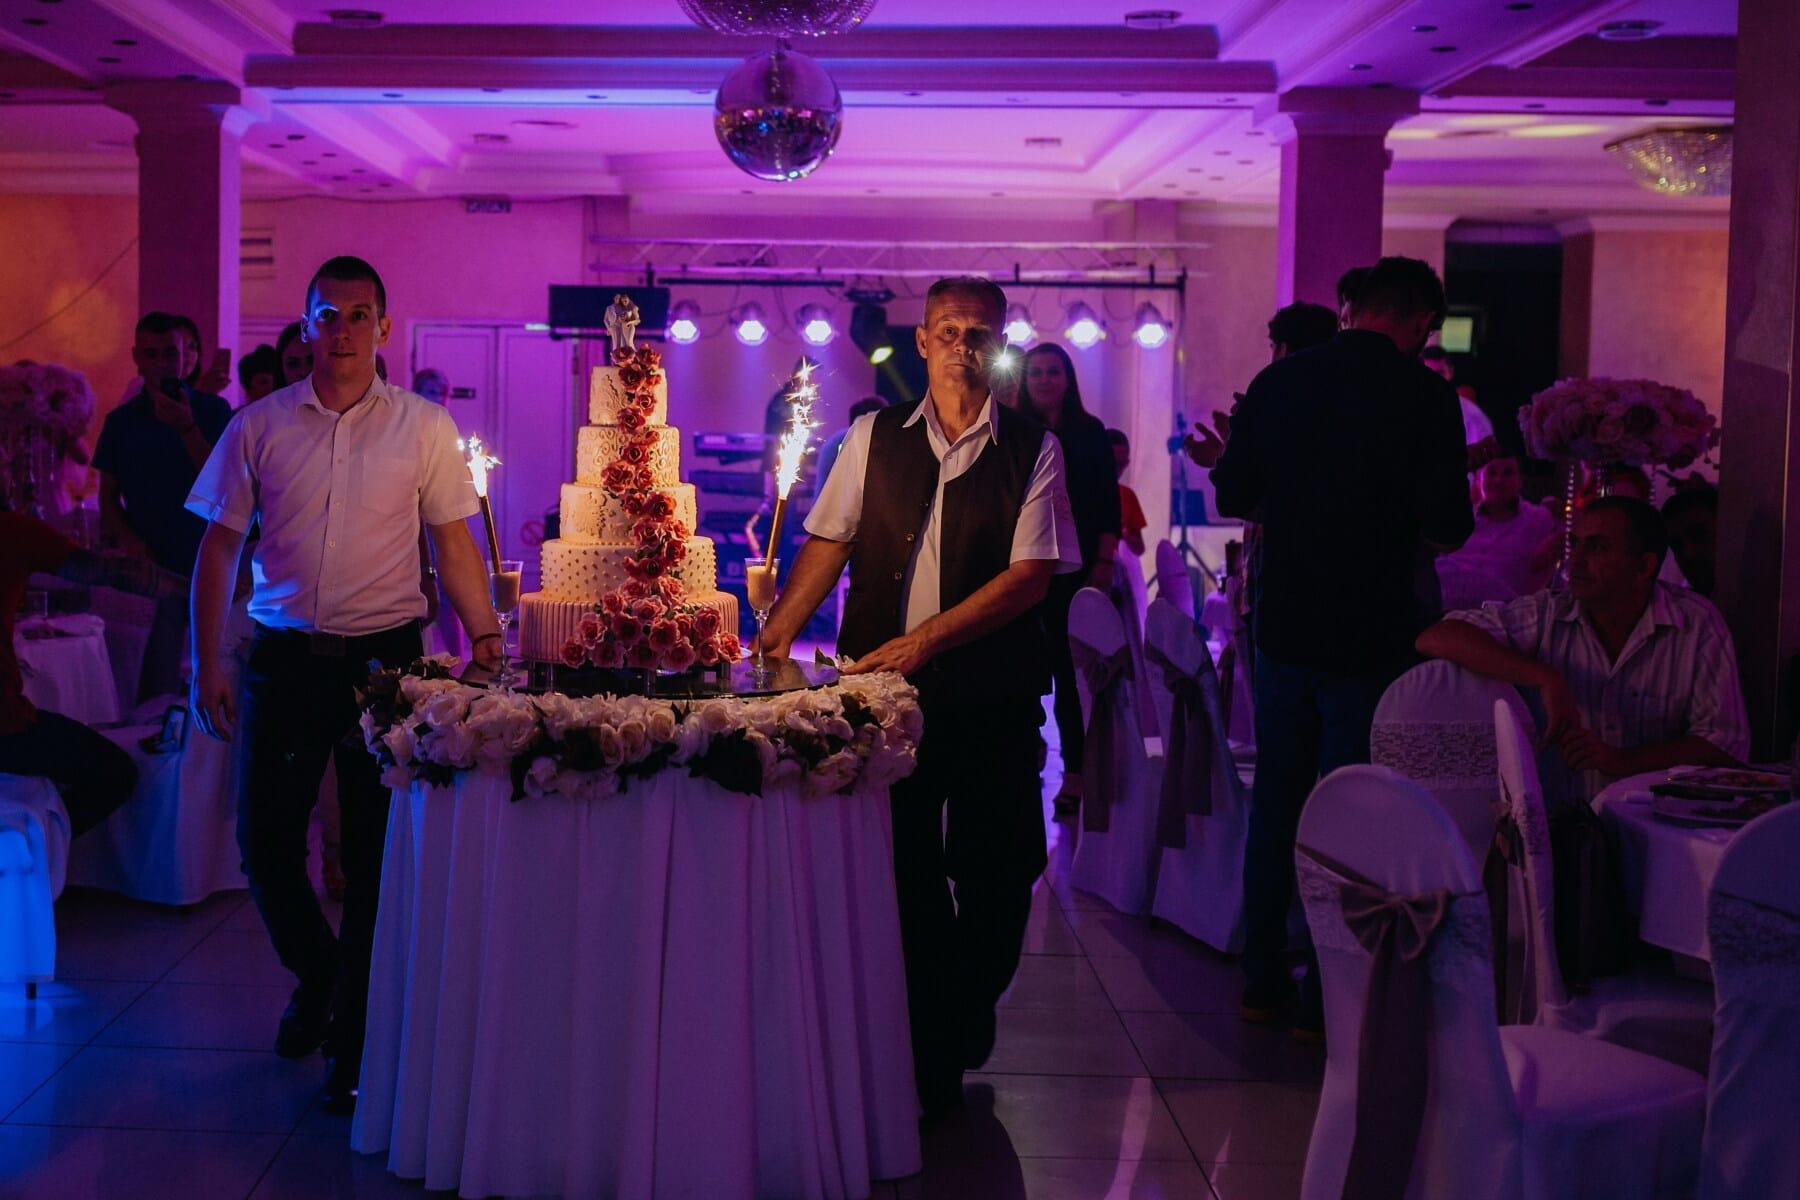 nightclub, wedding cake, bartender, ceremony, hotel, wedding, crowd, people, restaurant, bride